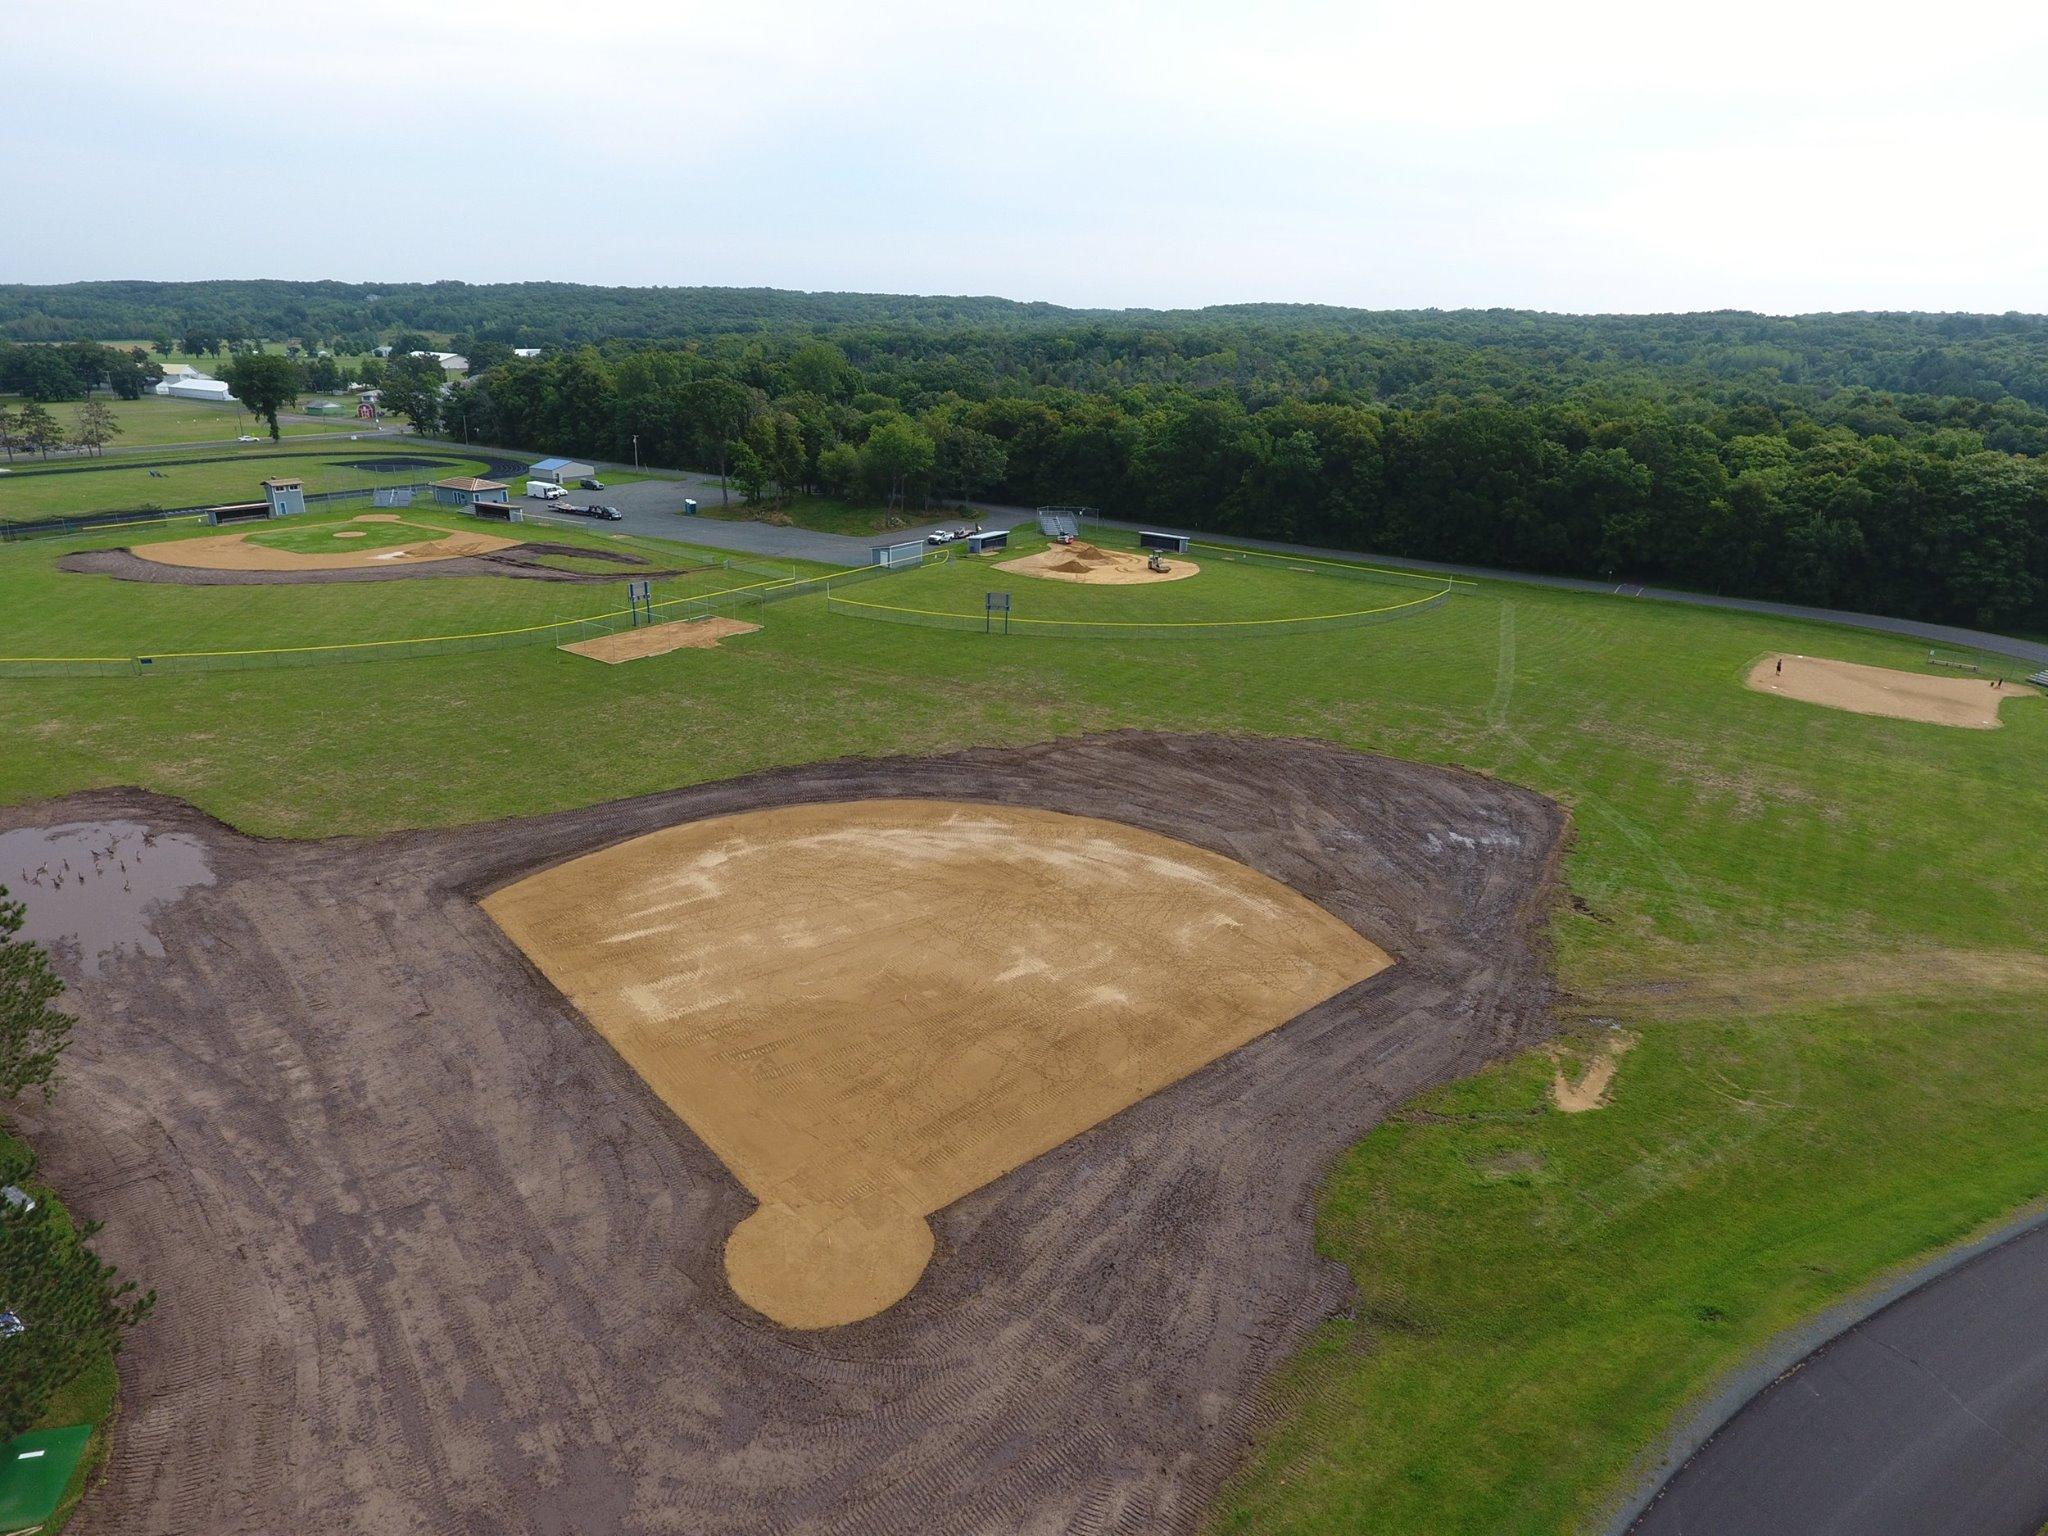 jsgc_excavation_08-21-2017_scf_baseball-1.jpg